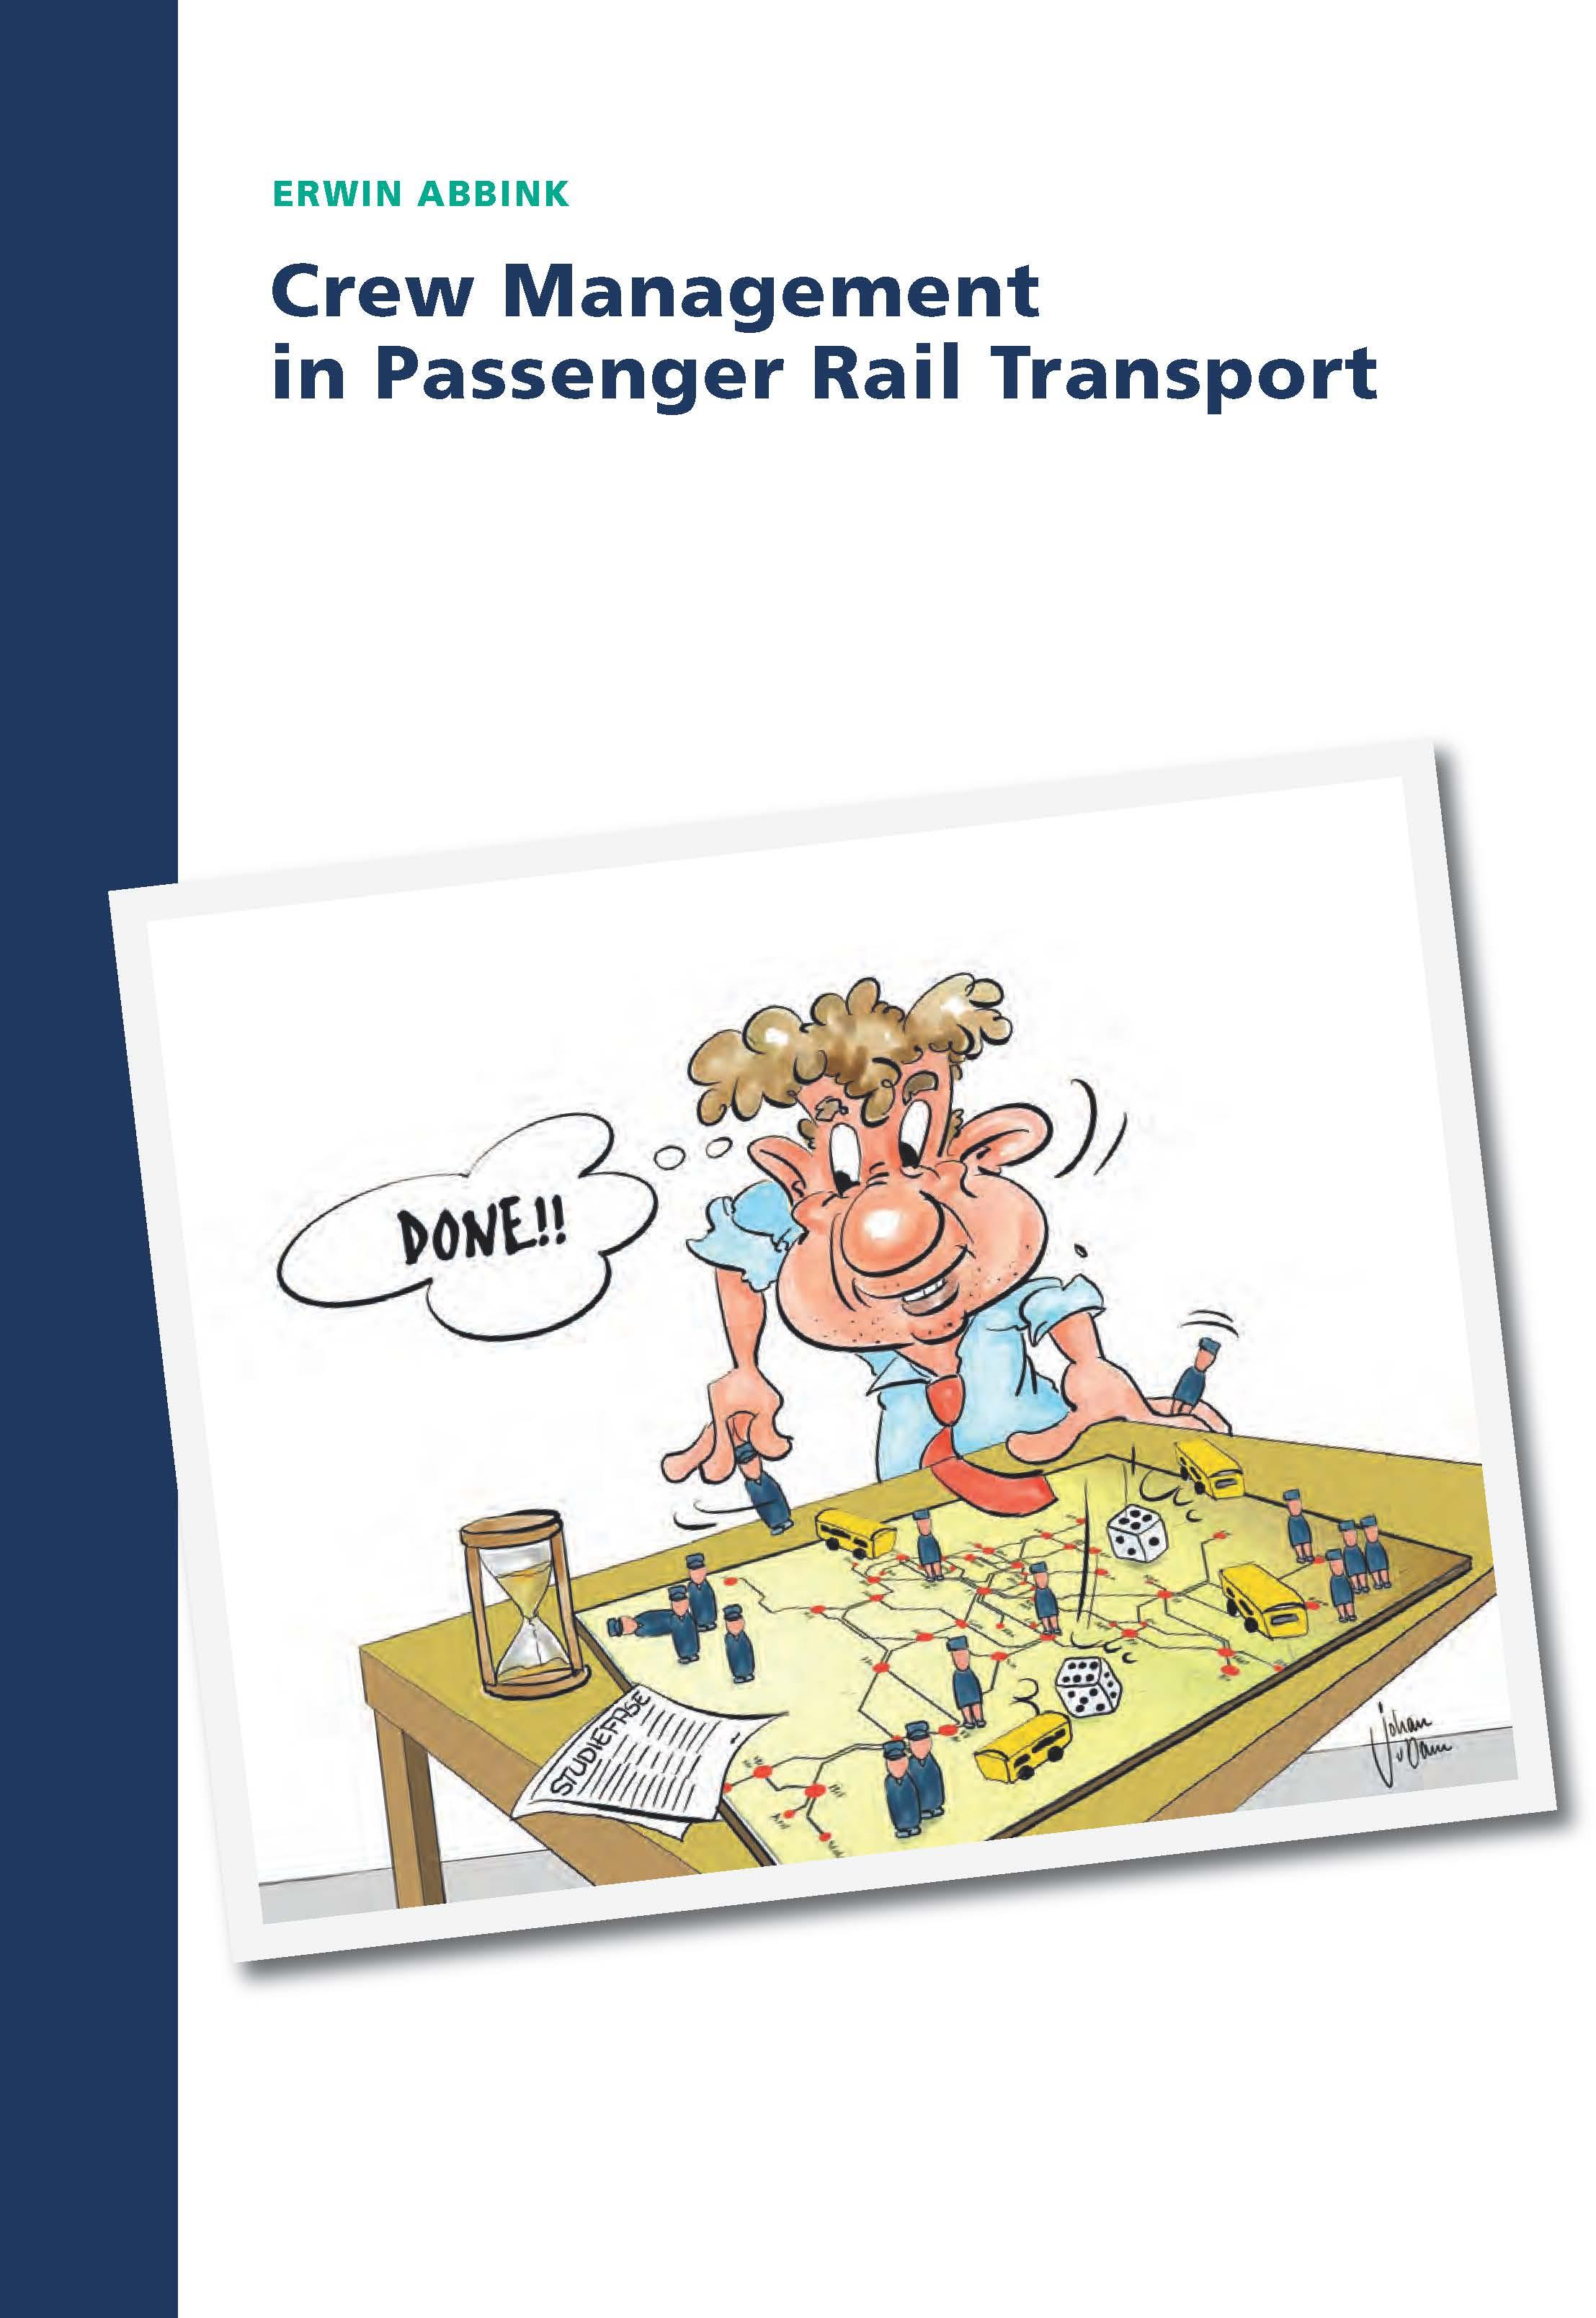 Crew Management in Passenger Rail Transport